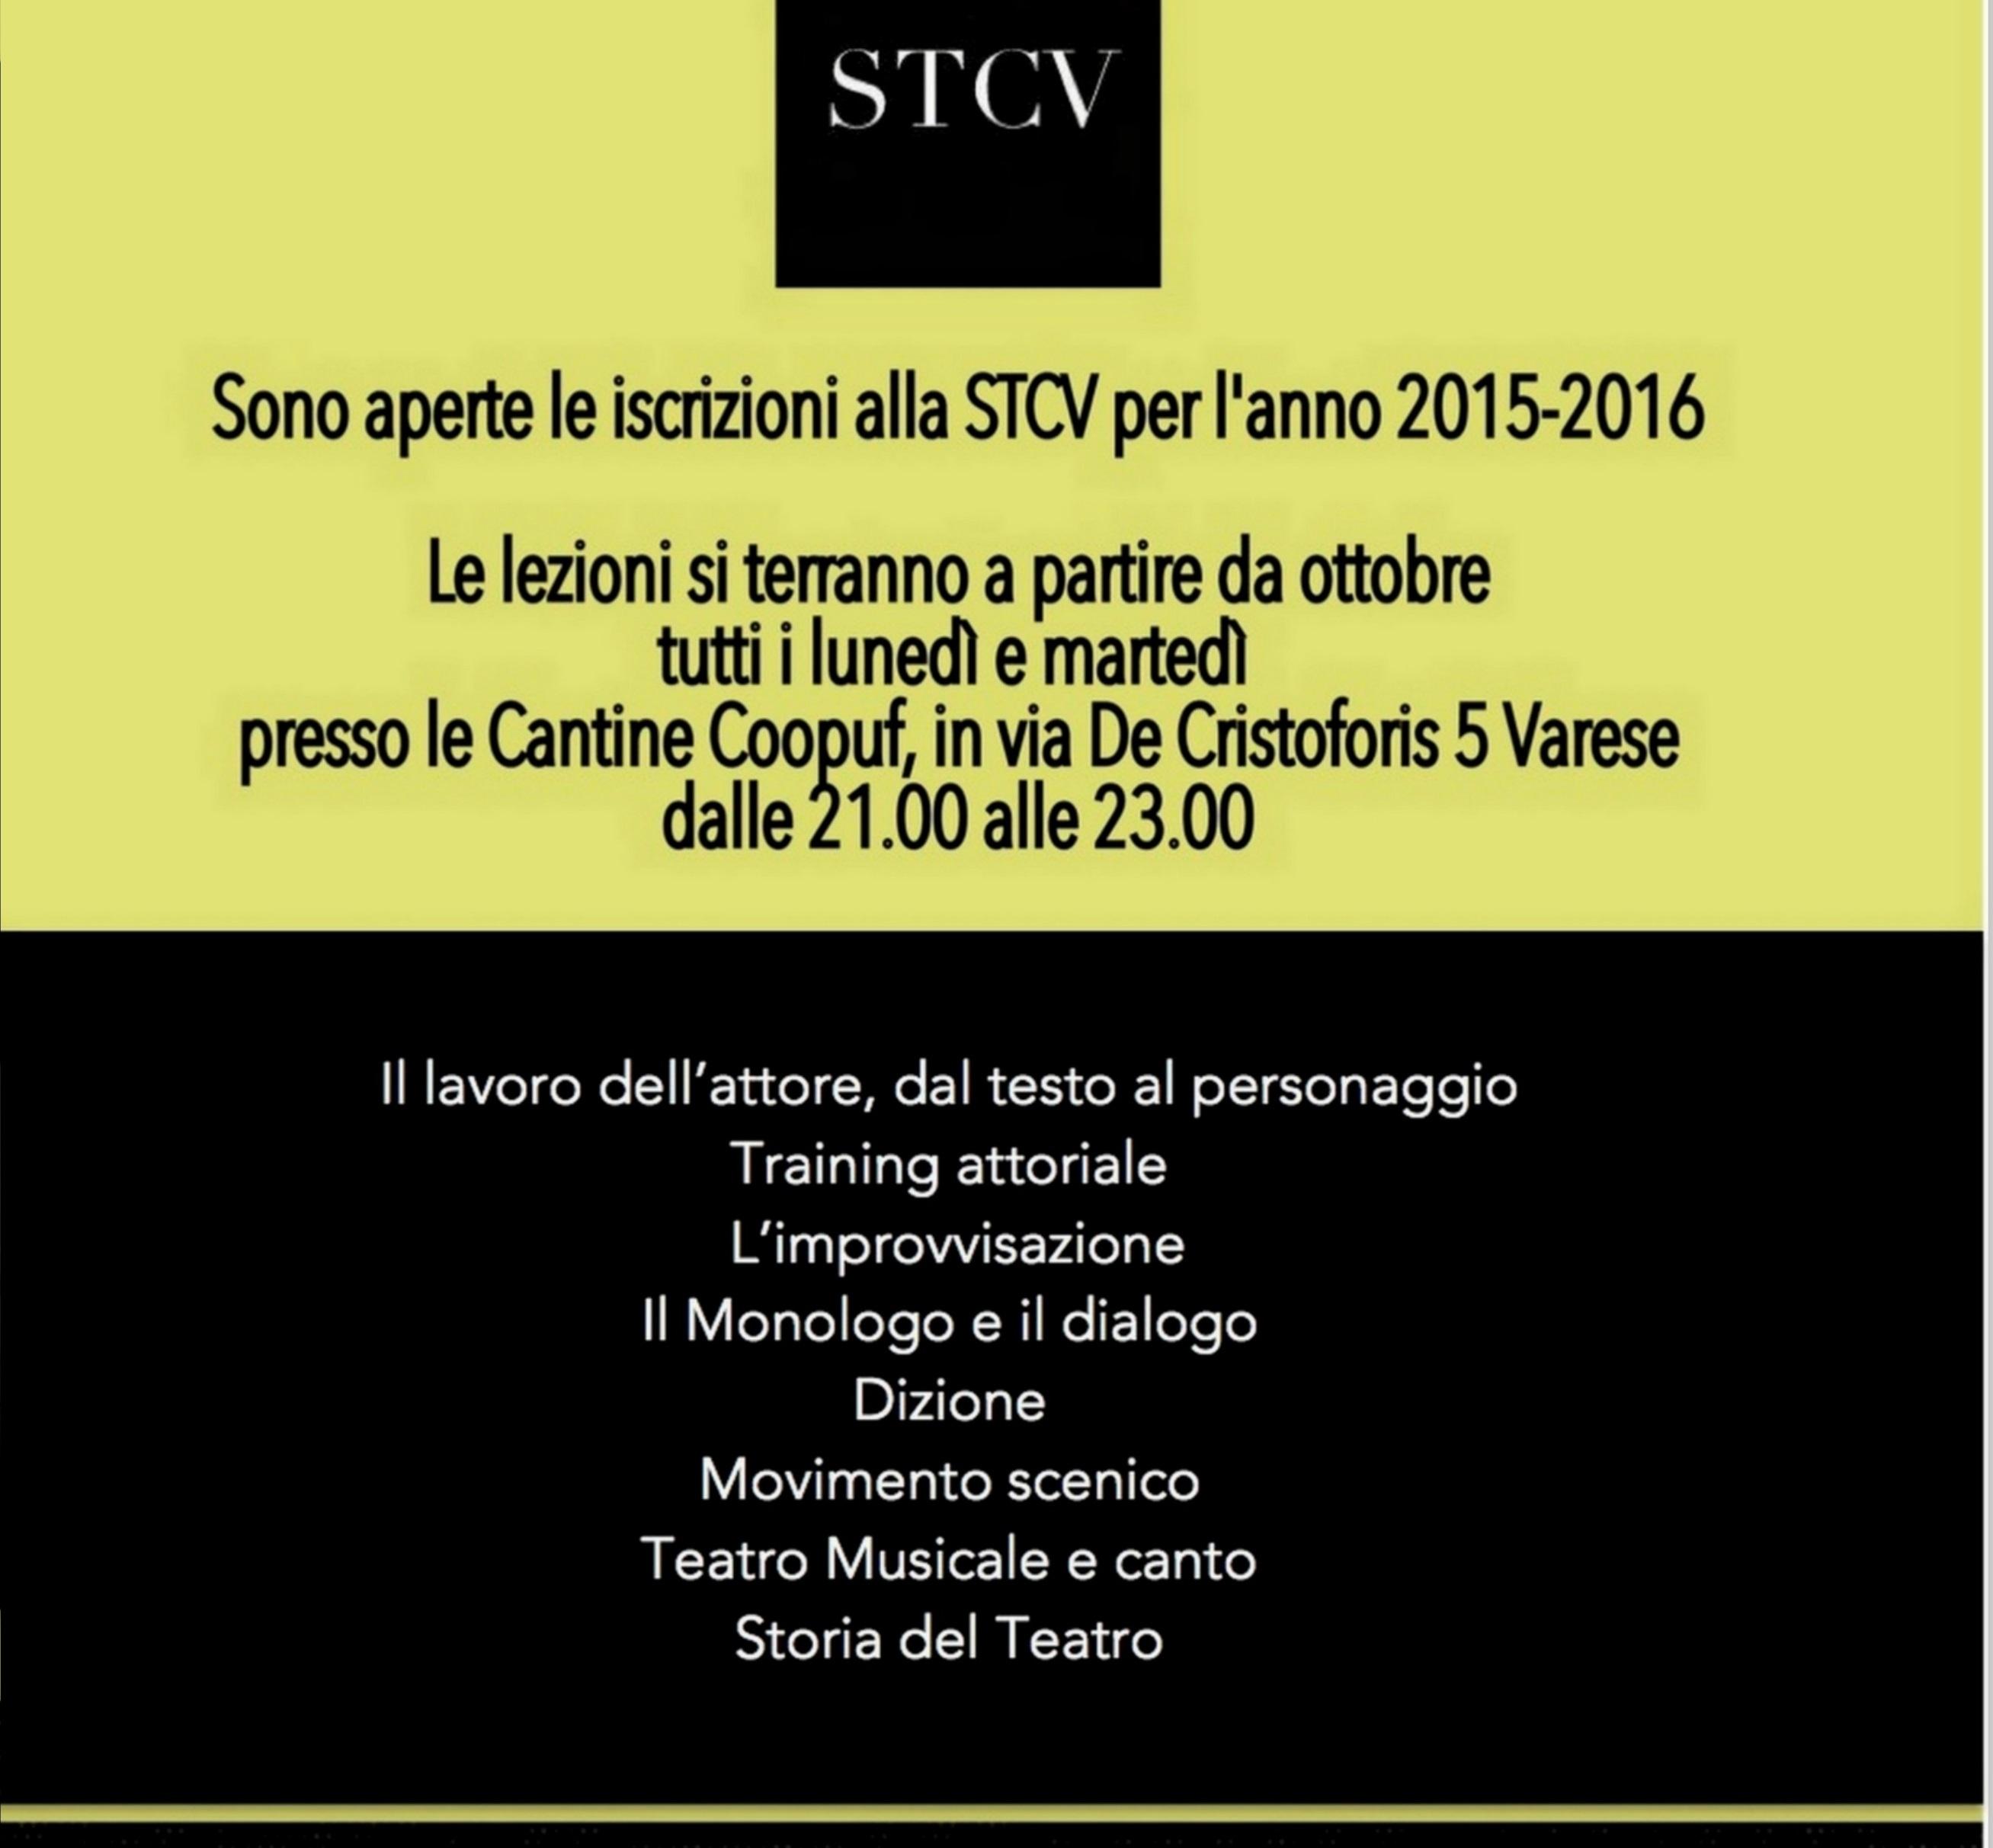 STCV 2